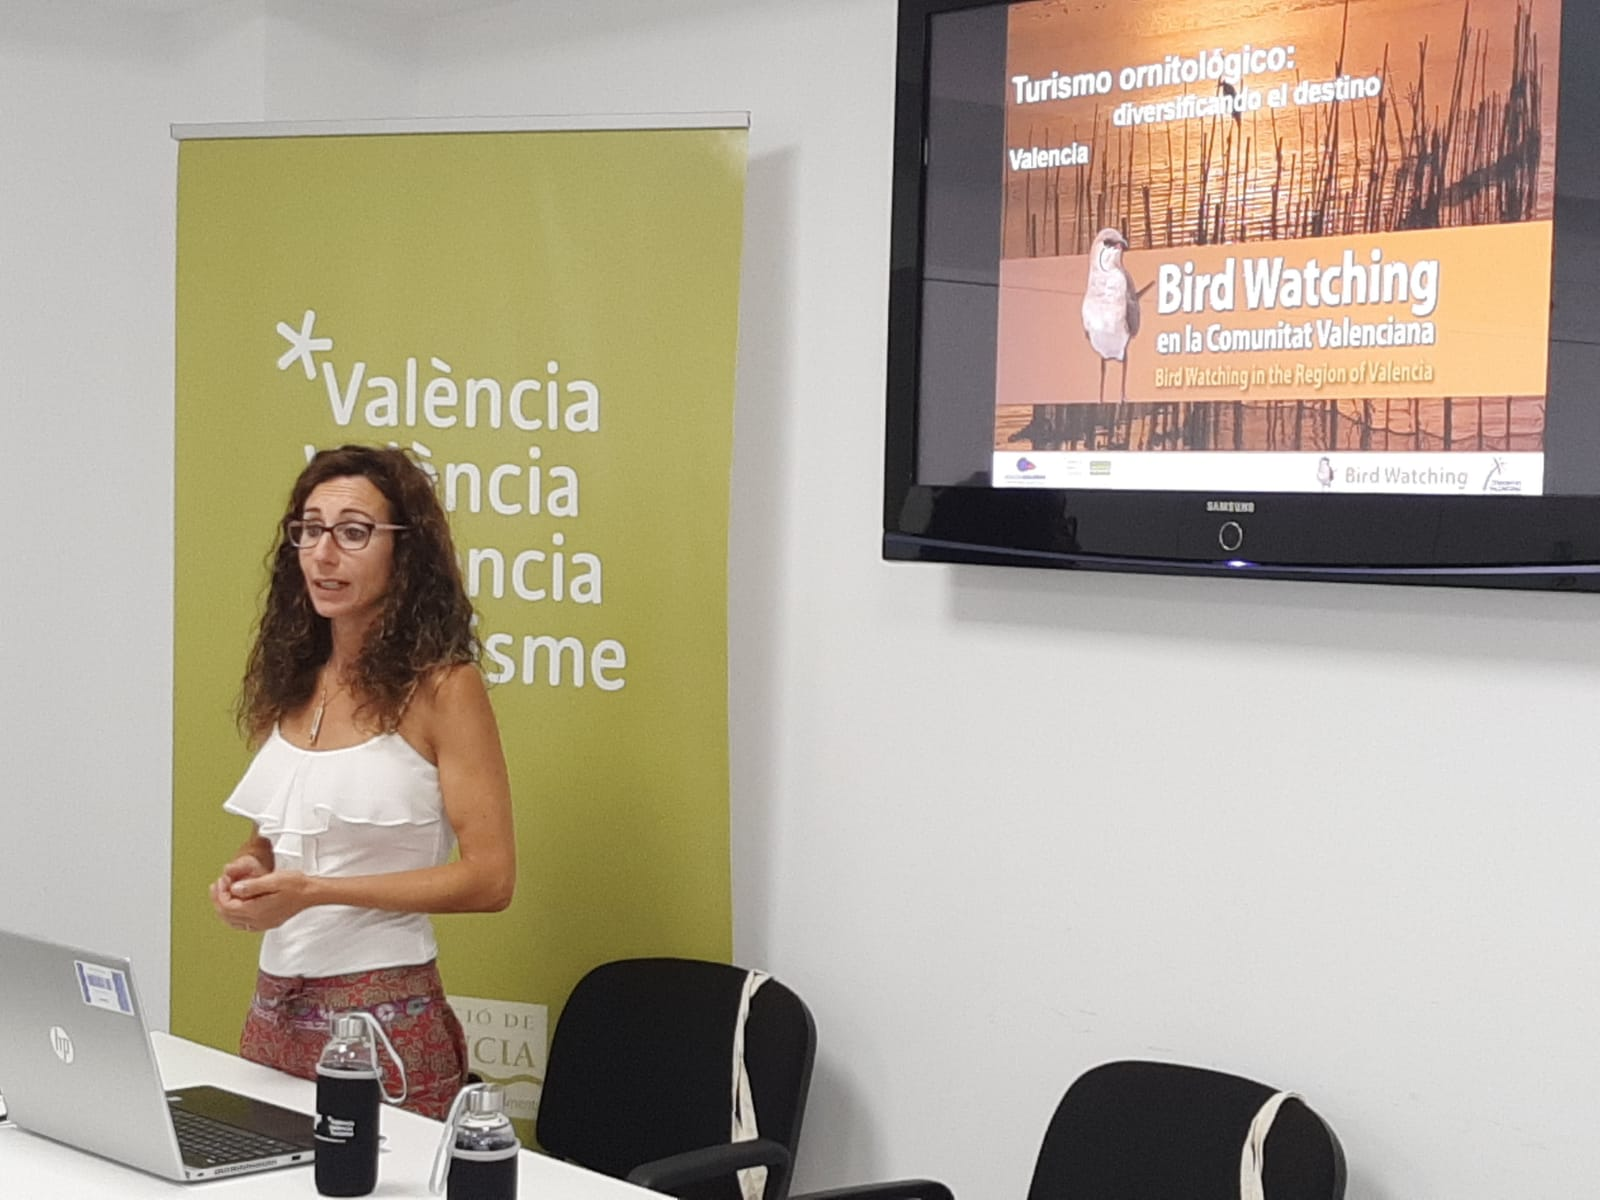 "El Patronat de Turisme de València organiza la primera jornada de birdwatching para diversificar el destino ""València""."